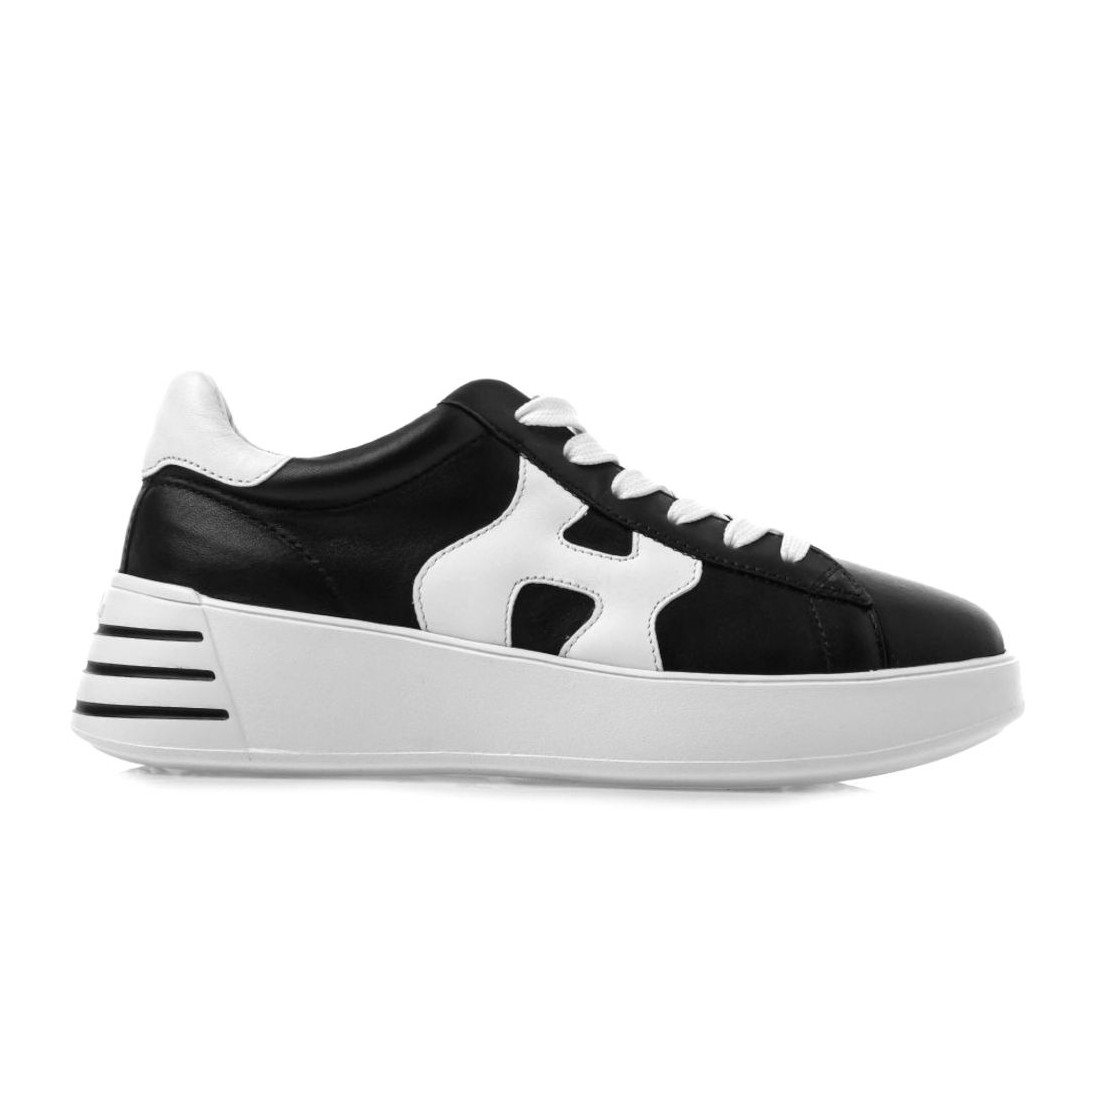 sneakers woman hogan hxw5640dn60ncr9999 8076